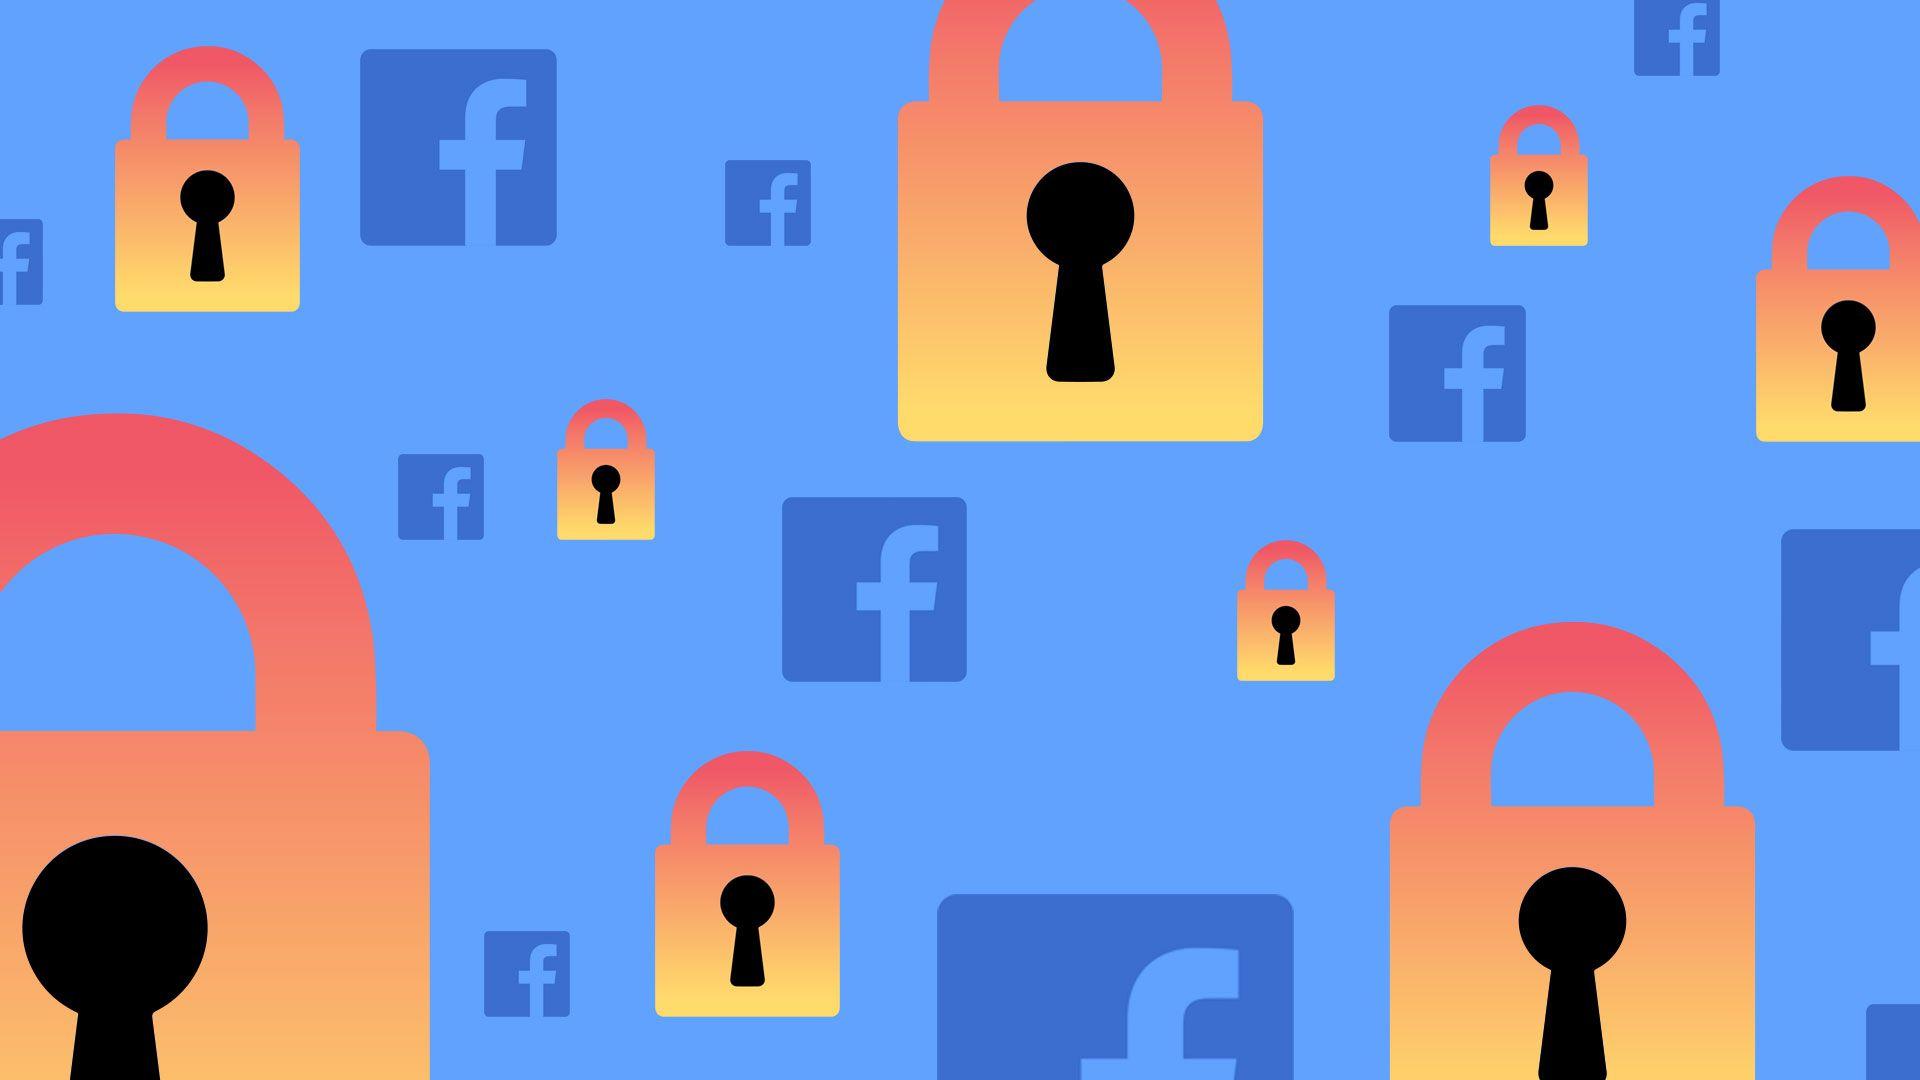 In this illustration, the Facebook logo floats on a light blue background alongside orange-red locks.